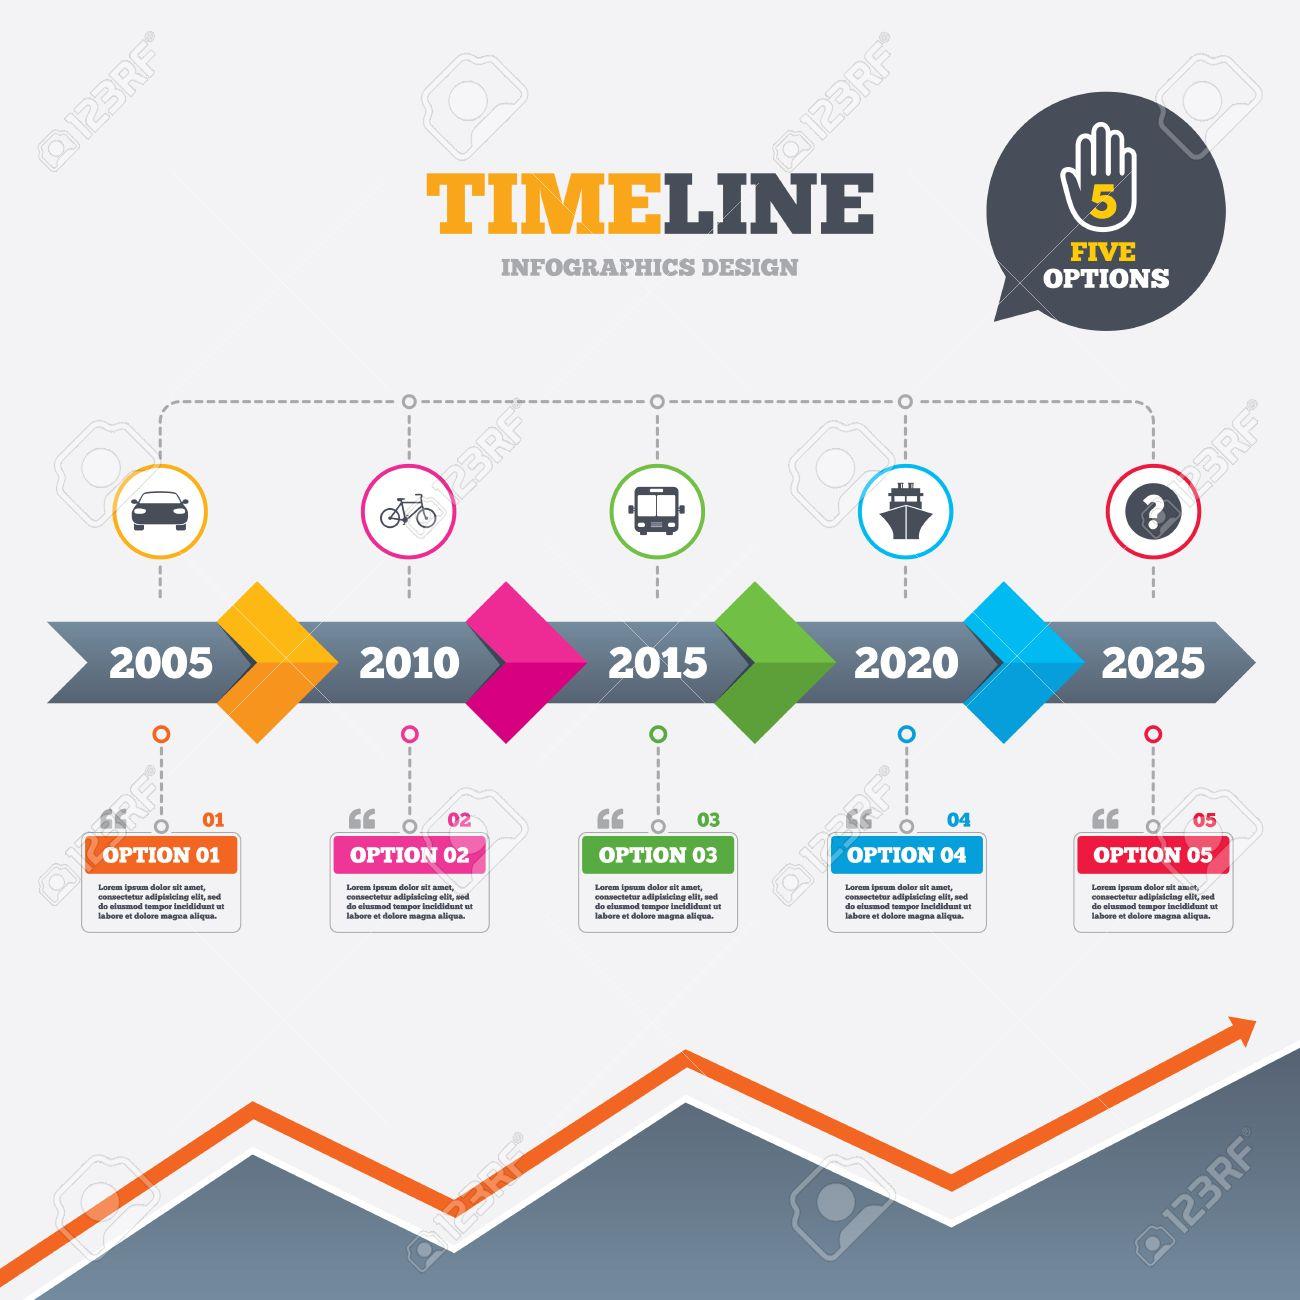 Timeline Infografik Mit Pfeilen. Transport Icons. Auto, Fahrrad, Bus ...